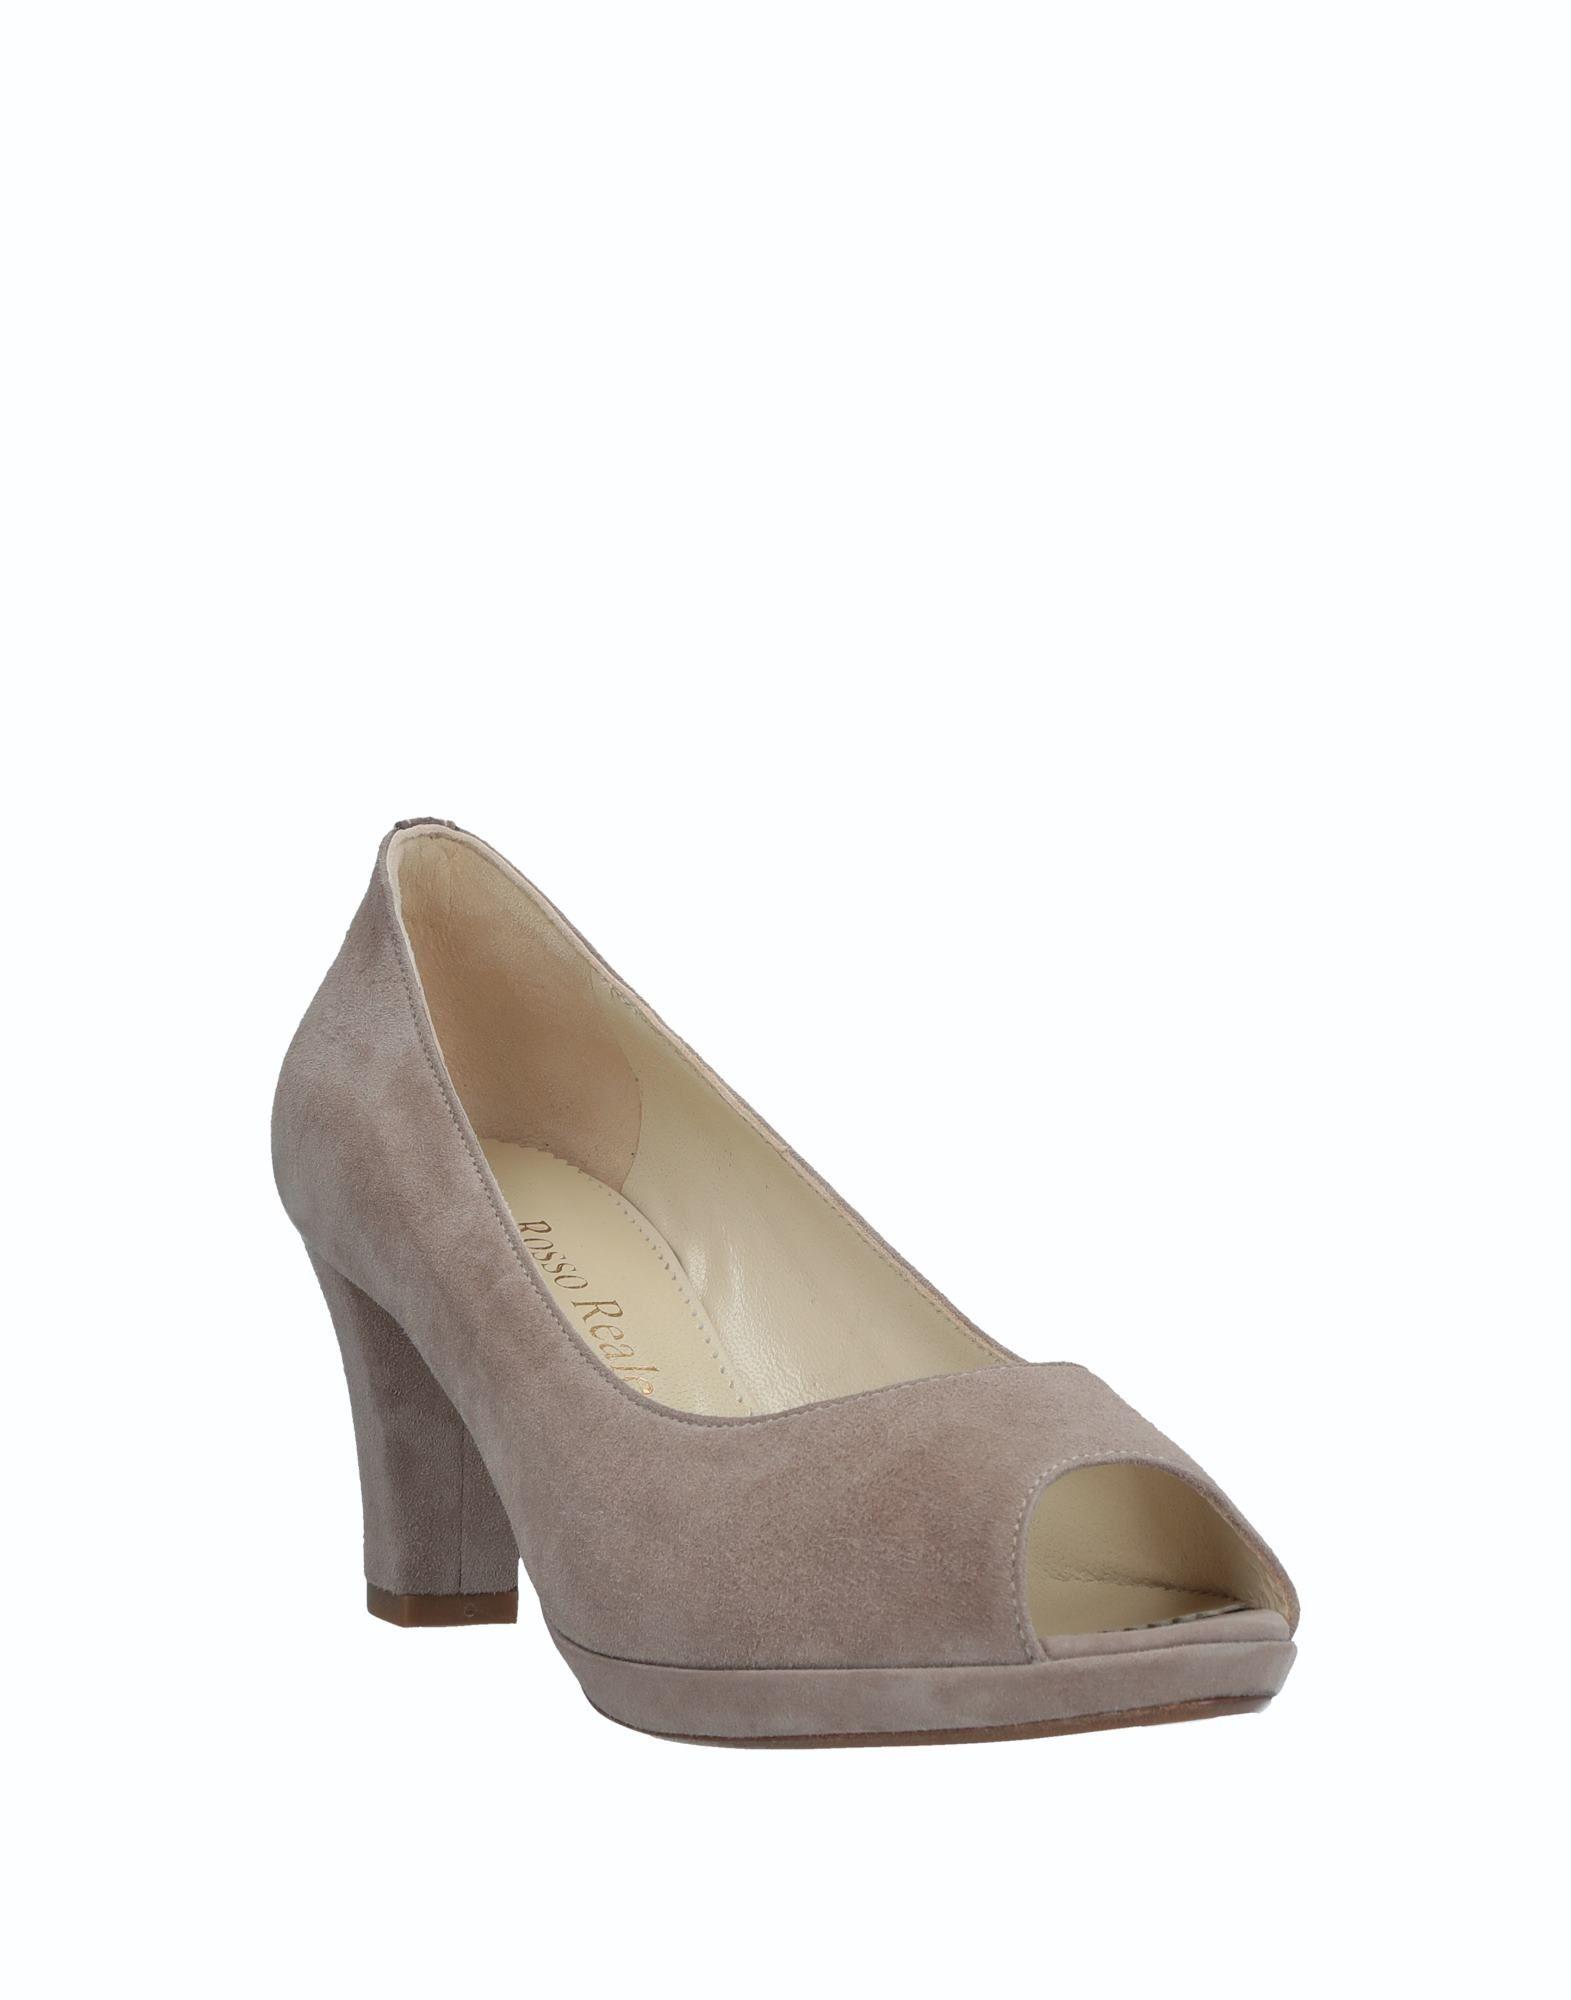 Rosso beliebte Reale Pumps Damen  11524942AP Gute Qualität beliebte Rosso Schuhe 5b8ea4